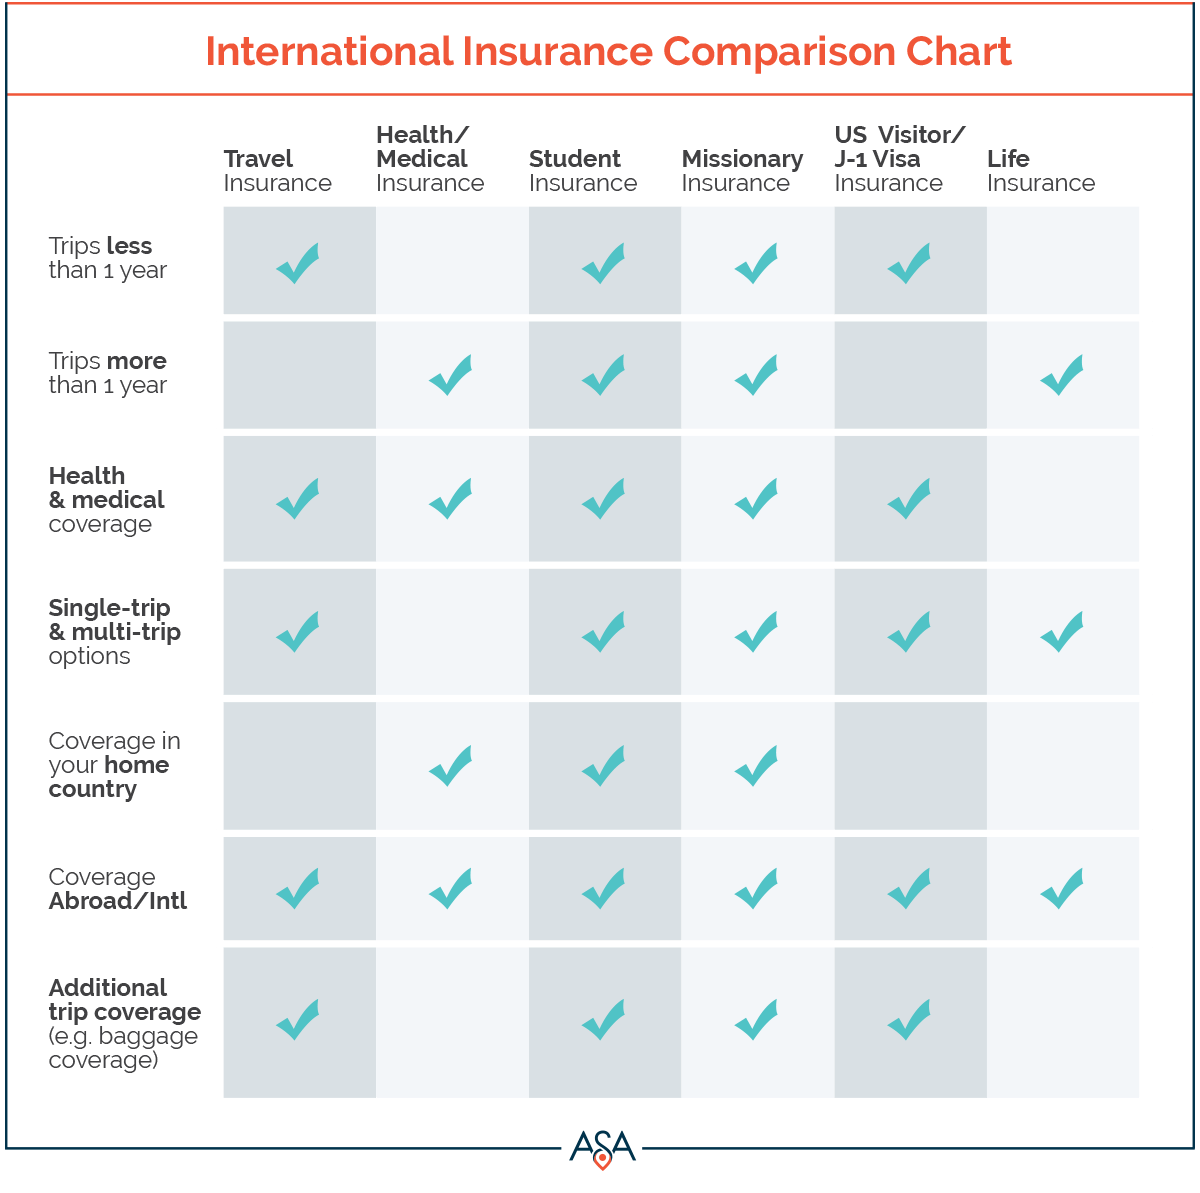 International insurance comparison chart jan also asa rh asaincor